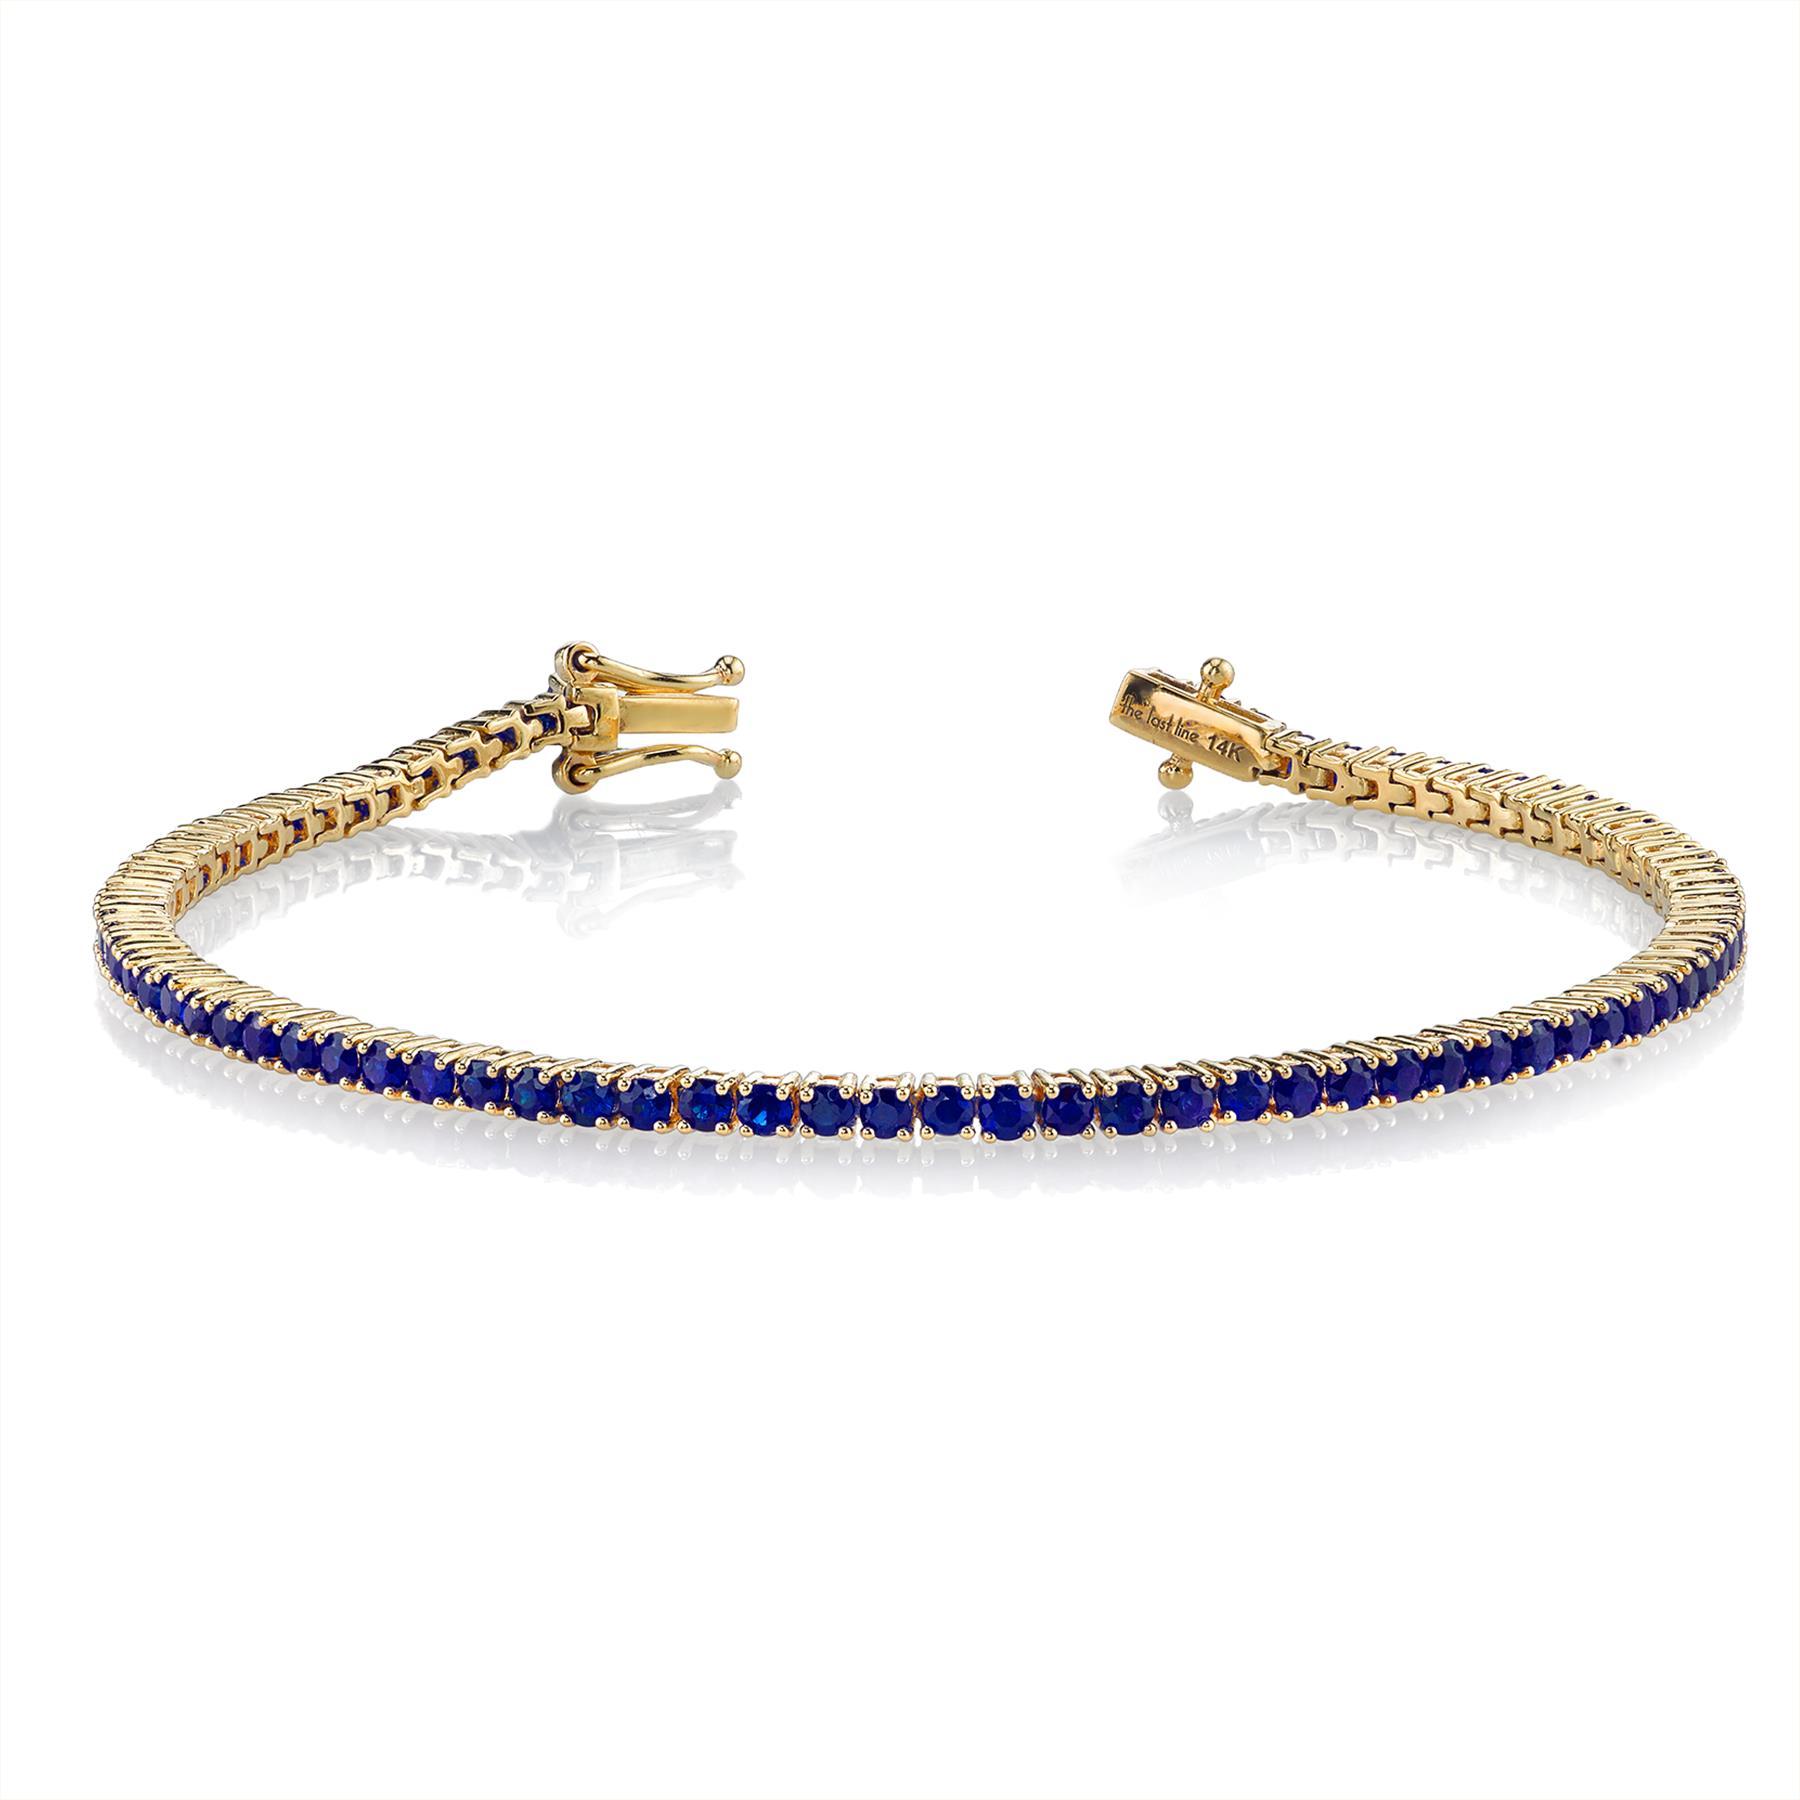 PERFECT BLUE SAPPHIRE TENNIS BRACELET